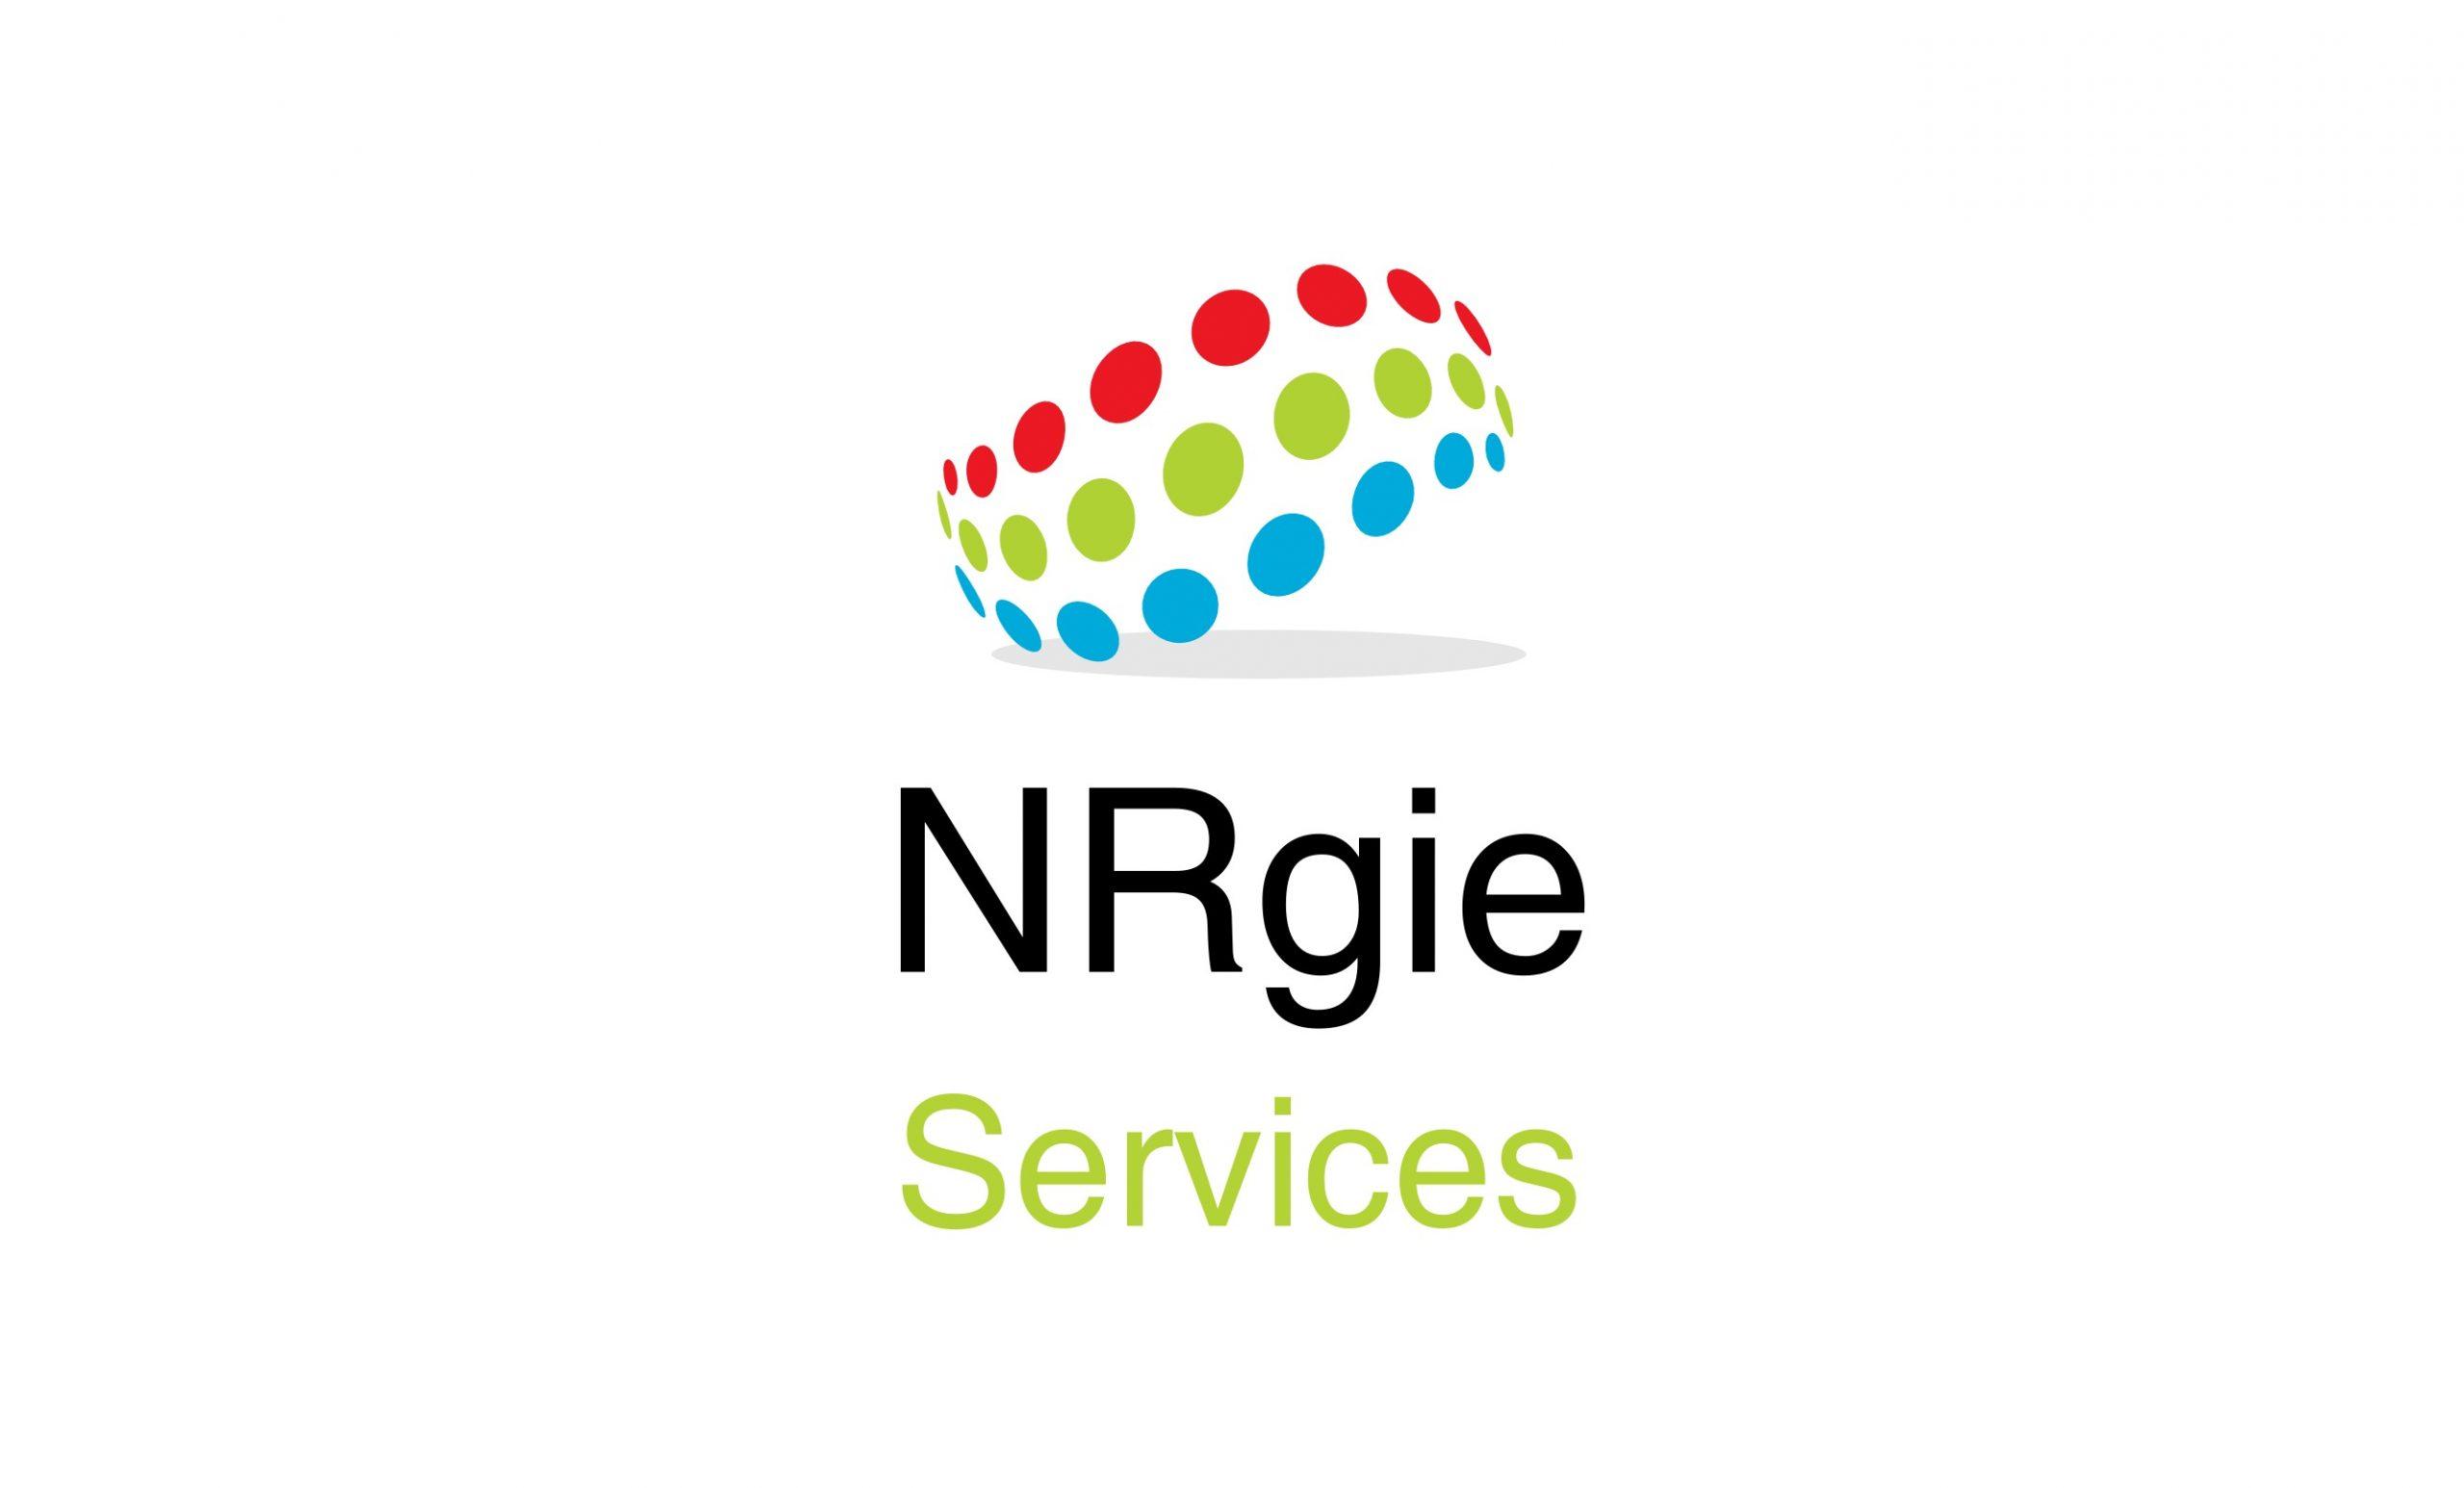 logo nrgie services